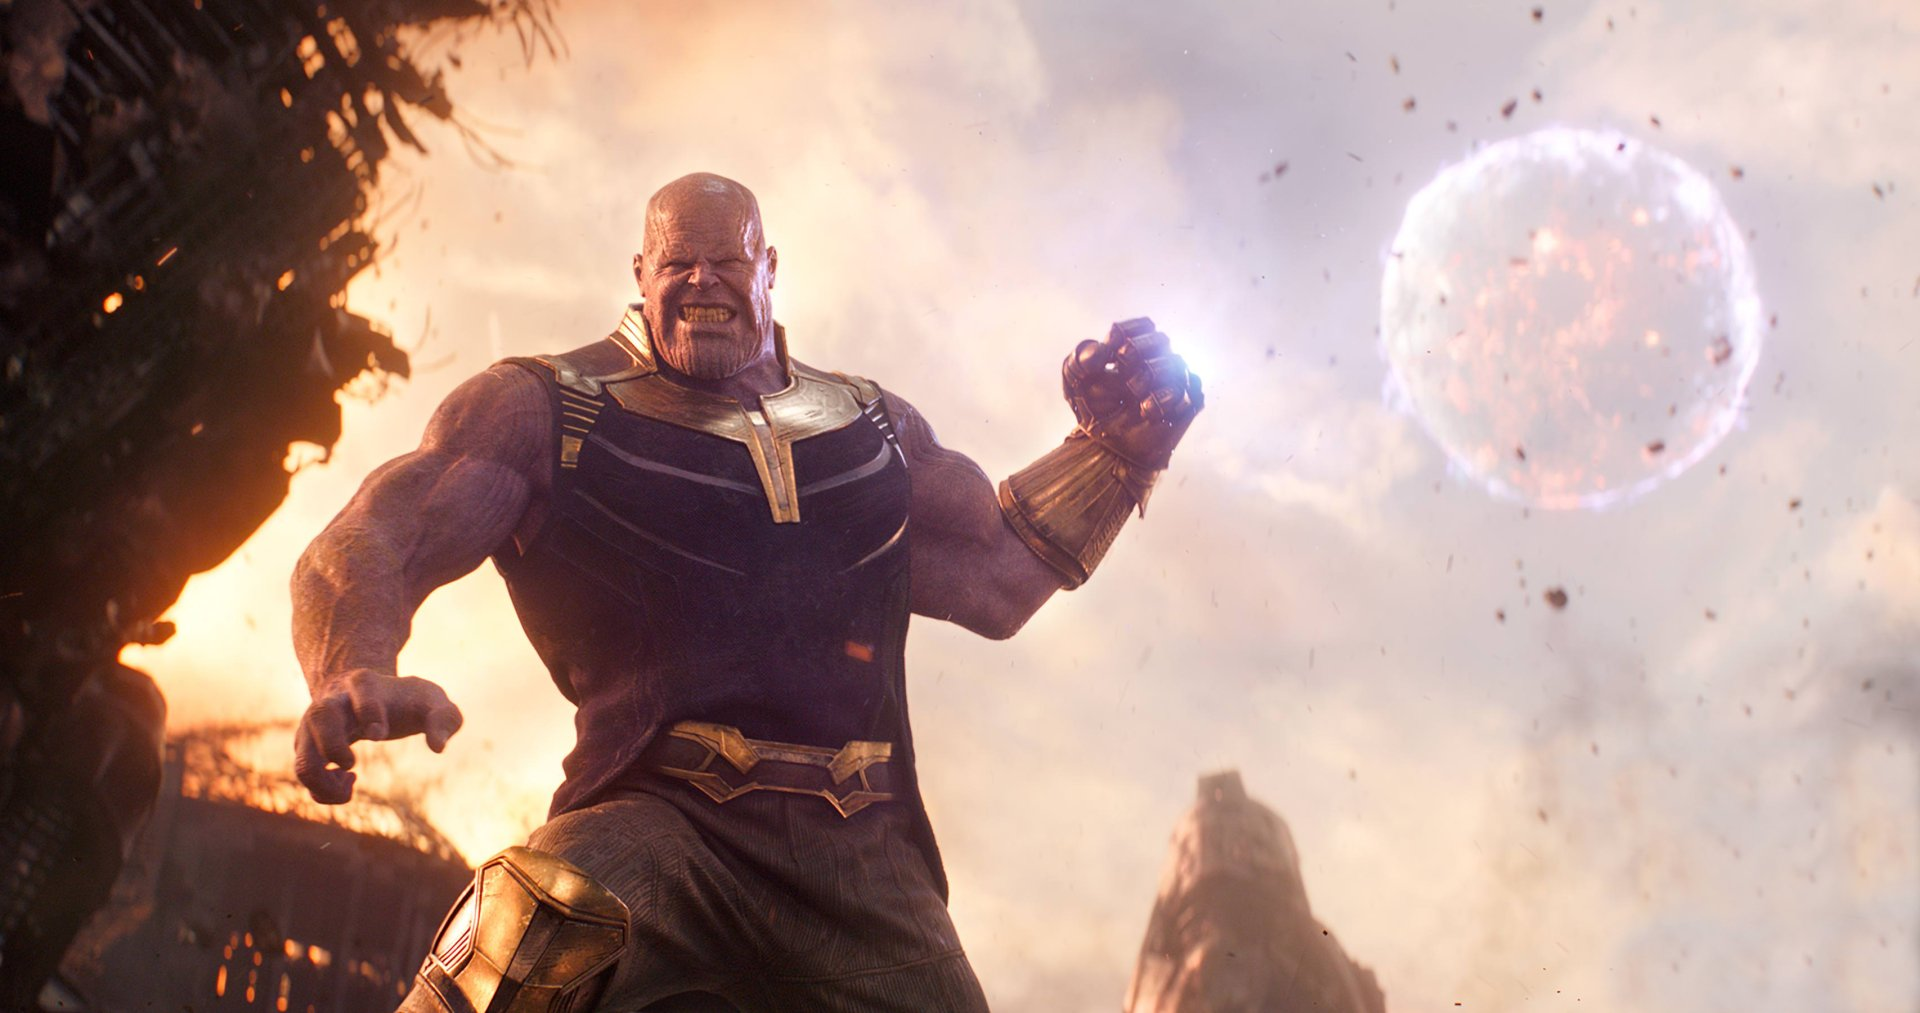 Movie - Avengers: Infinity War  Thanos Josh Brolin Wallpaper